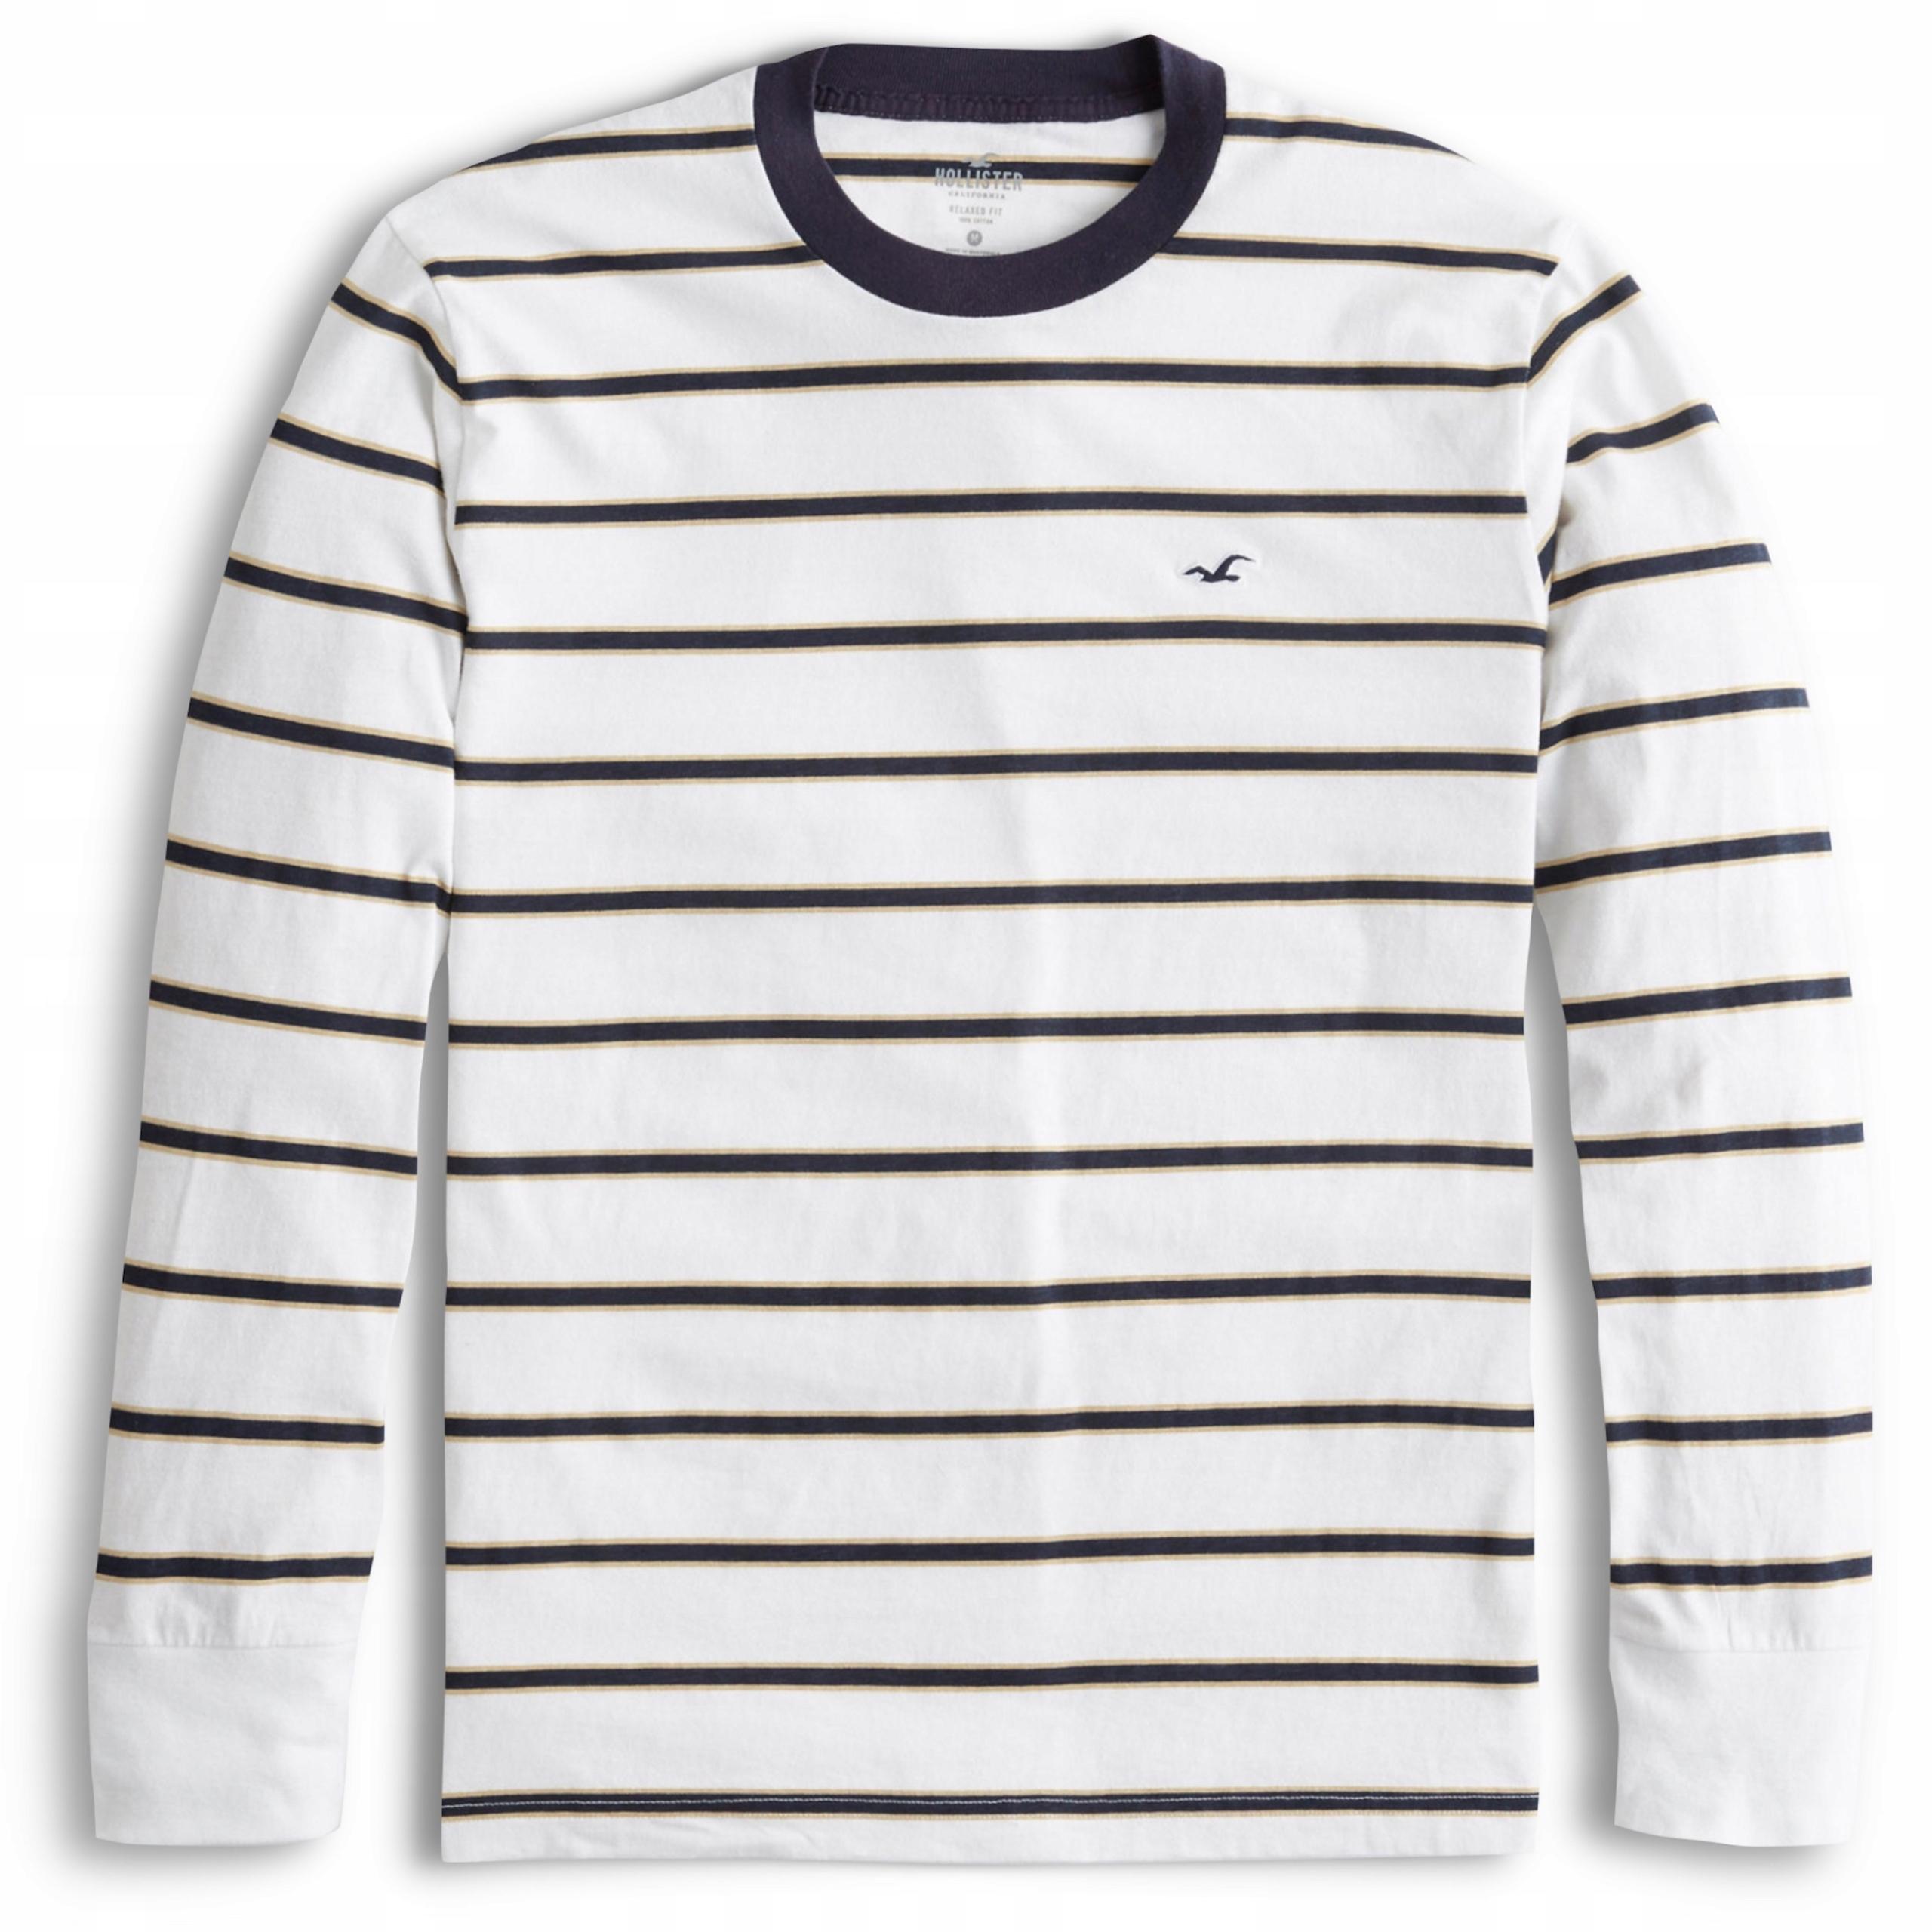 Longsleeve Koszulka Logo HOLLISTER Abercrombie L